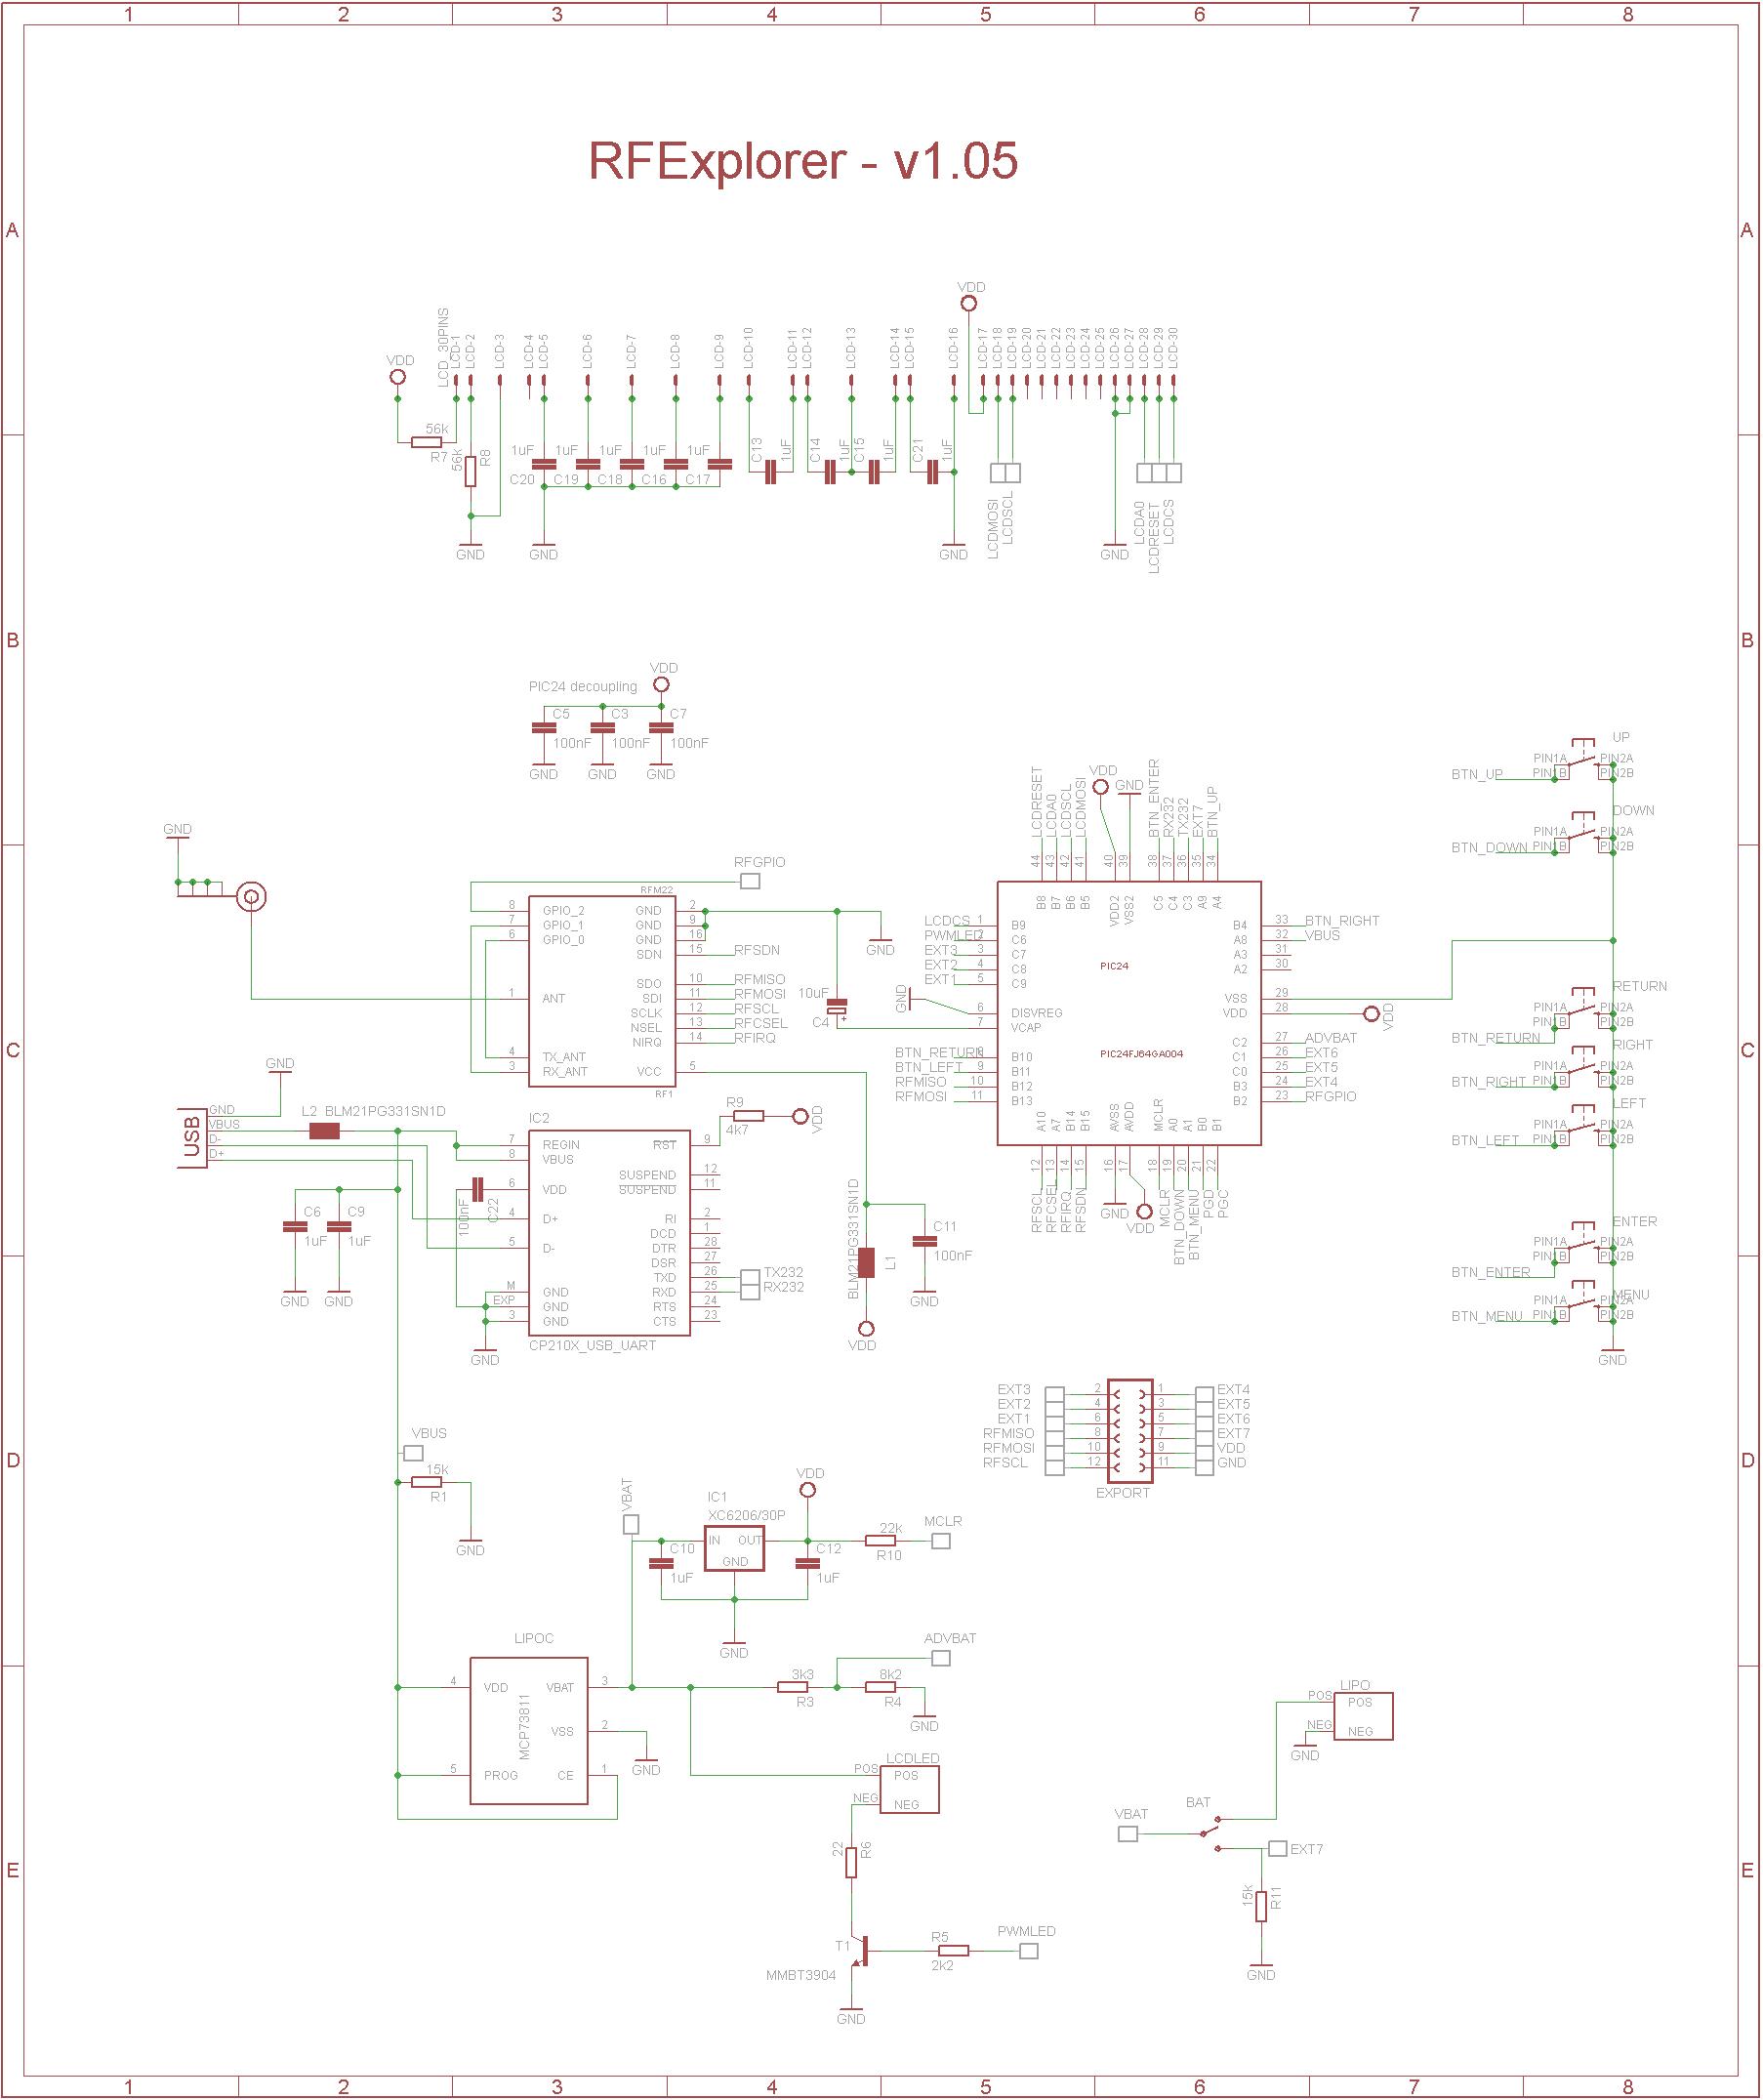 rf explorer schematics - rfexplorer